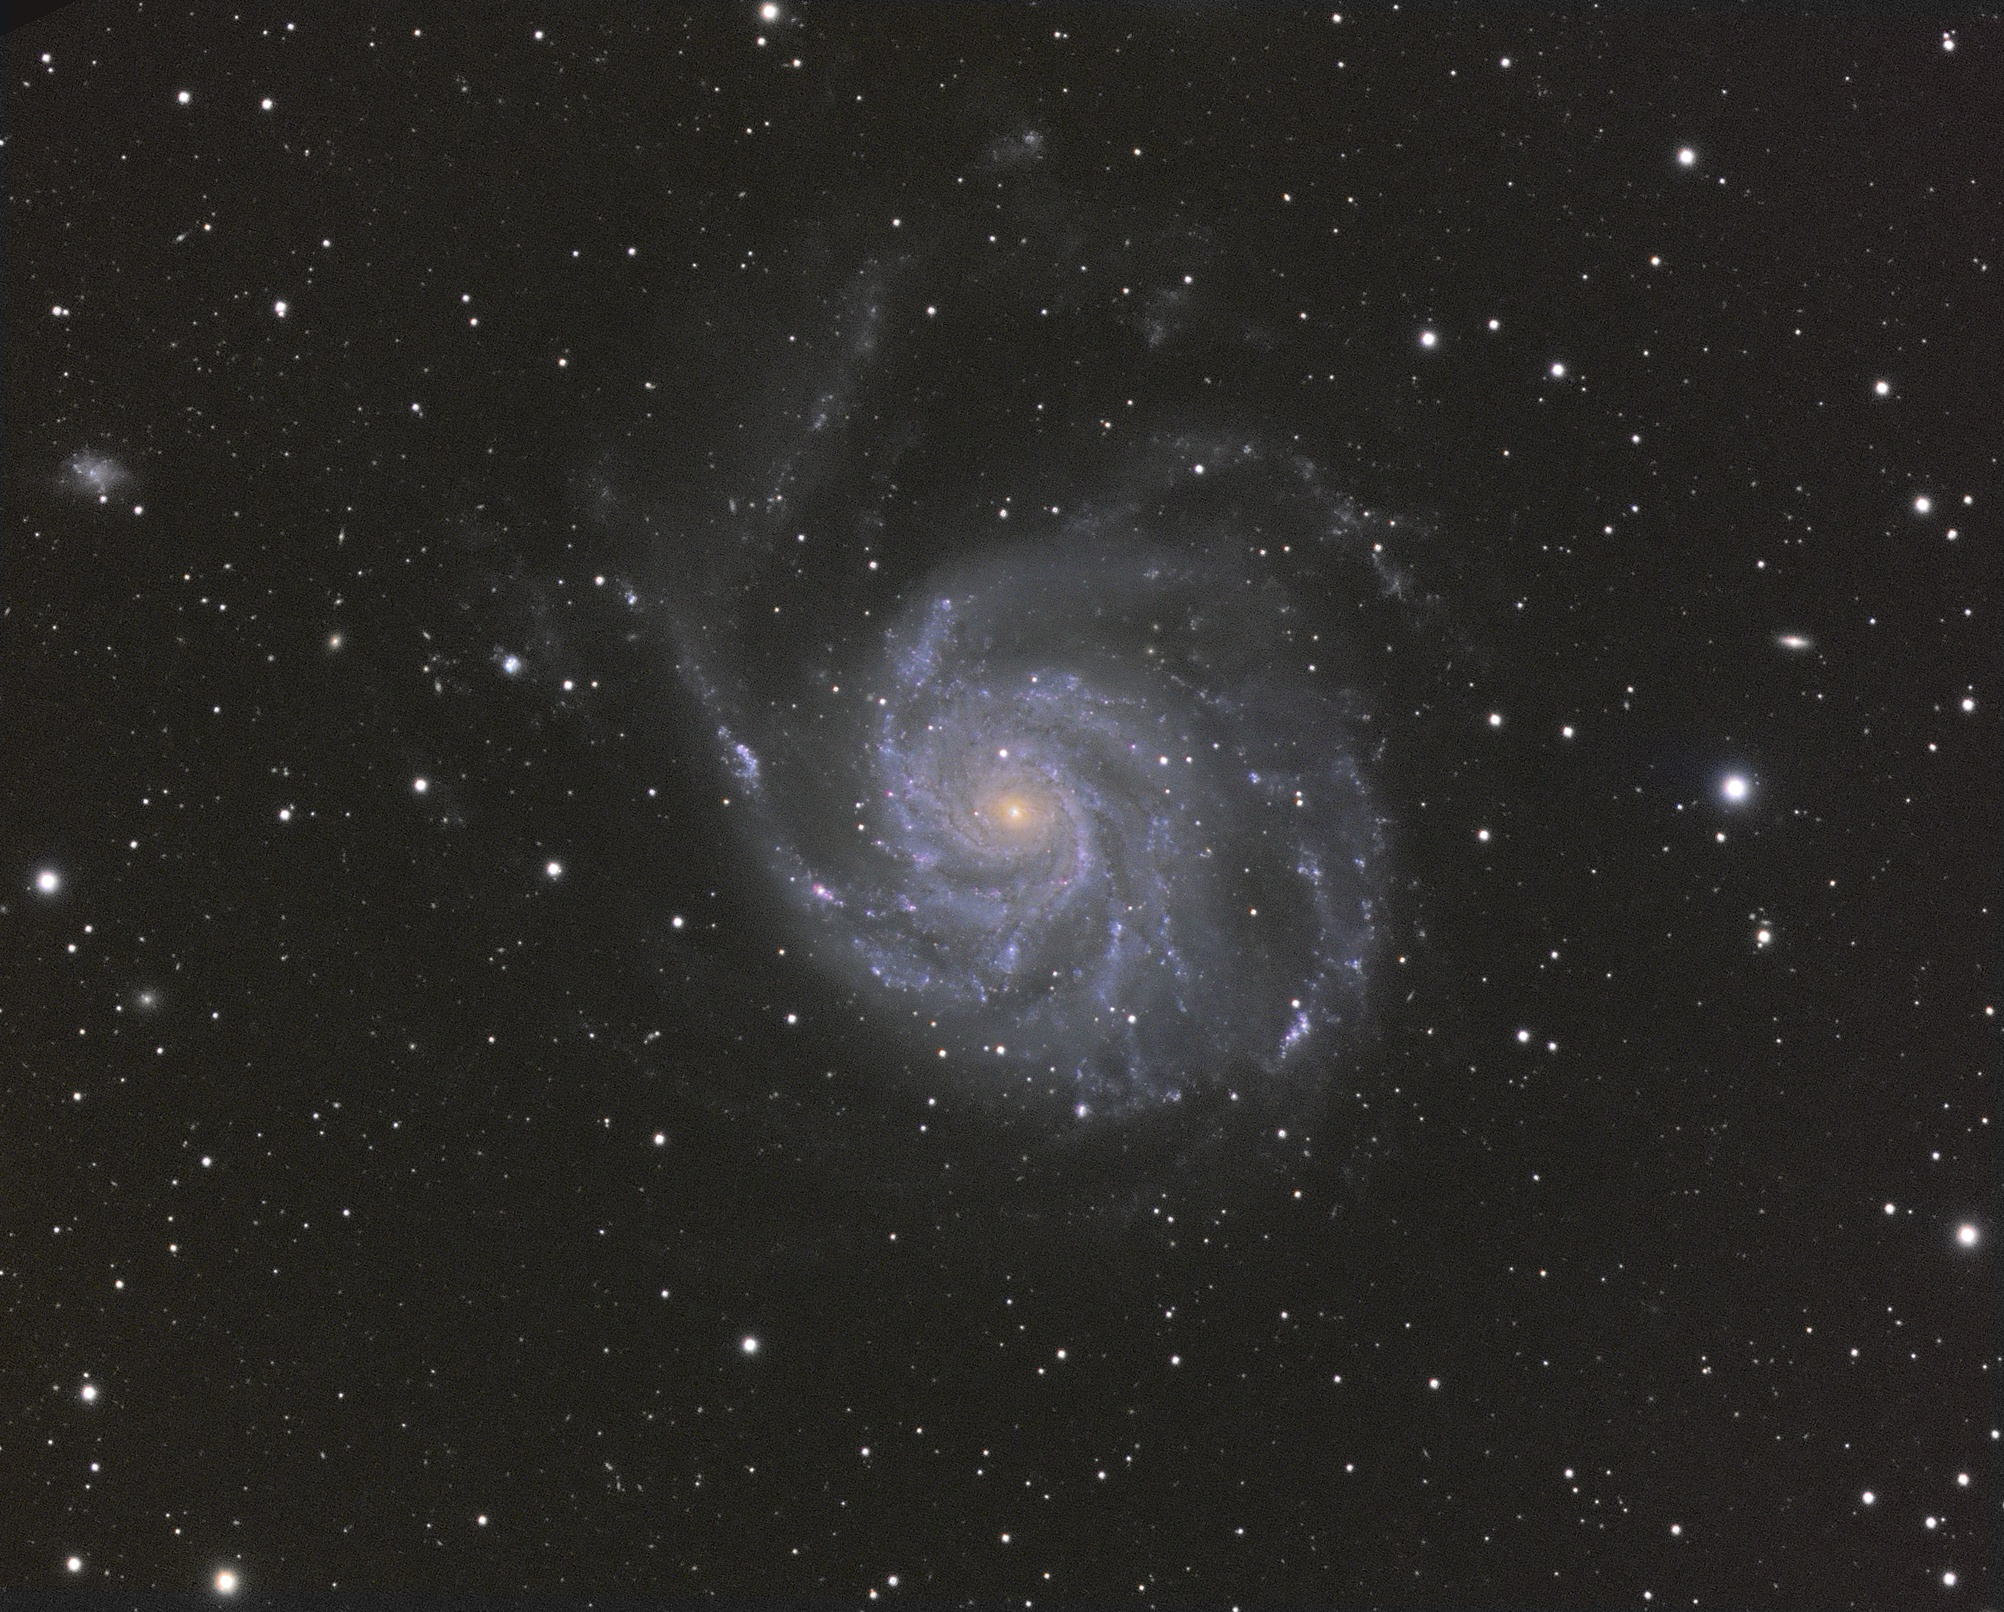 M101_T450_LumColmic.jpg